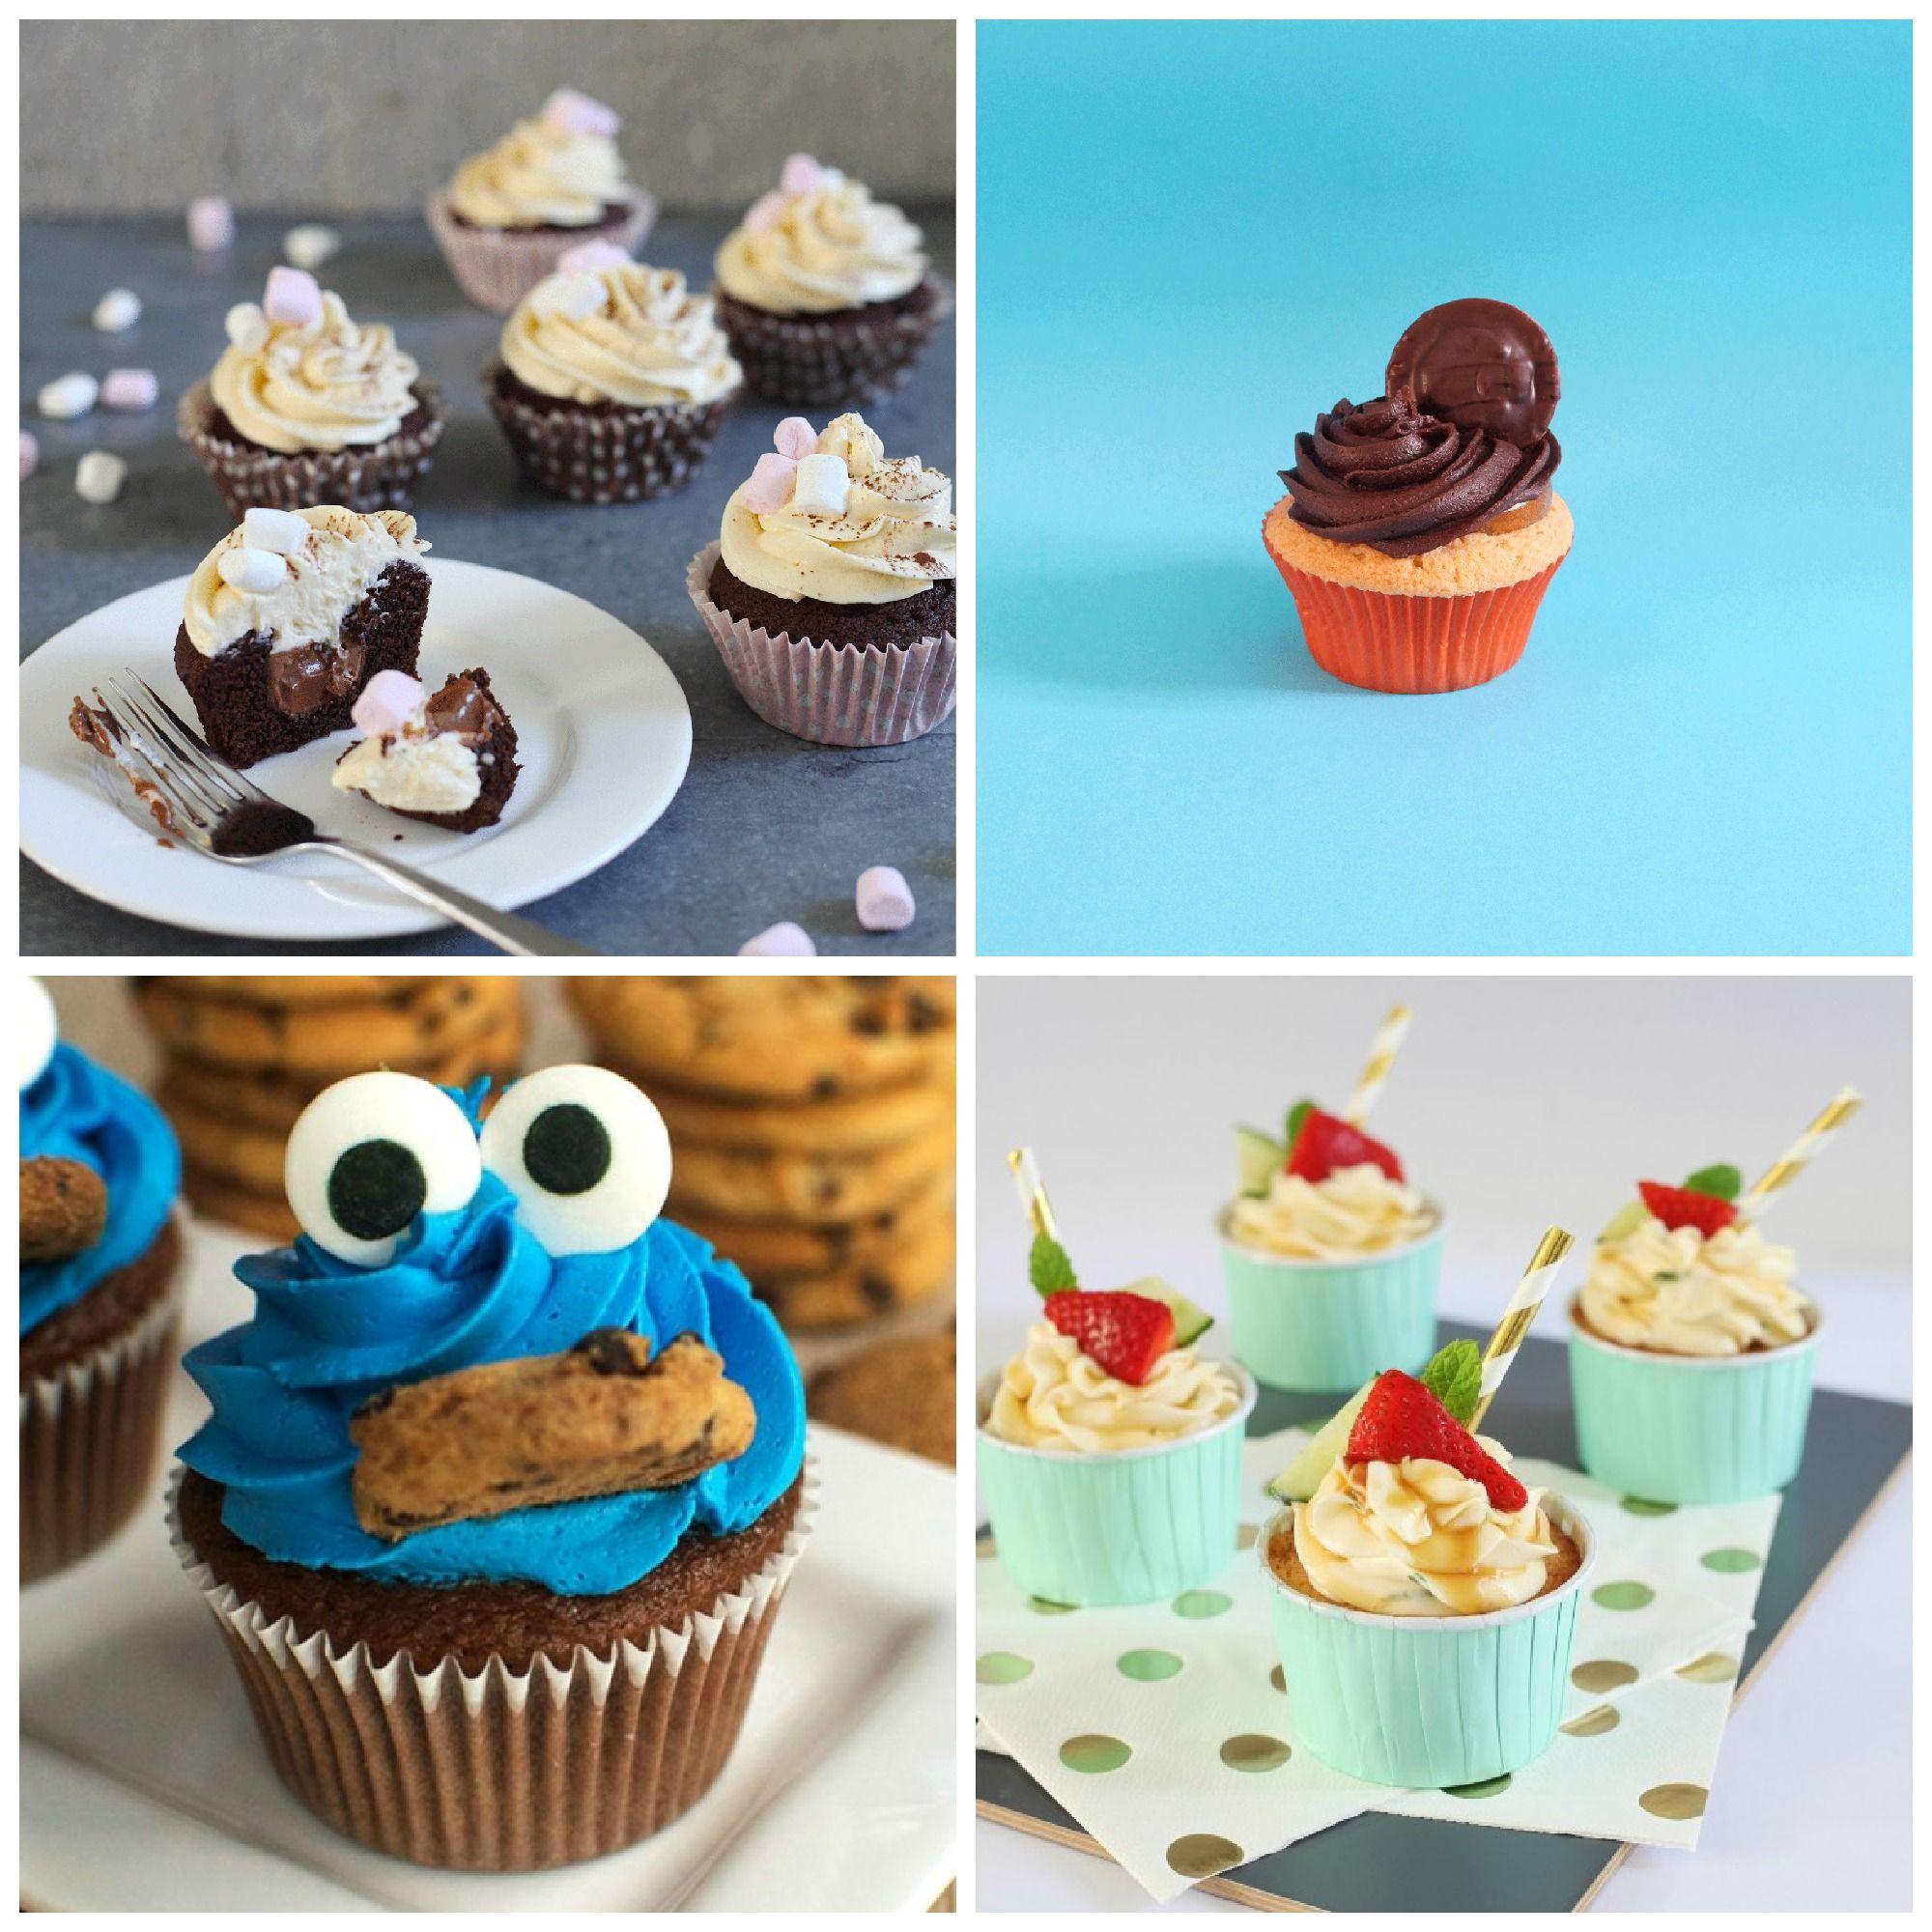 Best Cupcake Recipes 22 Easy Cupcake Ideas